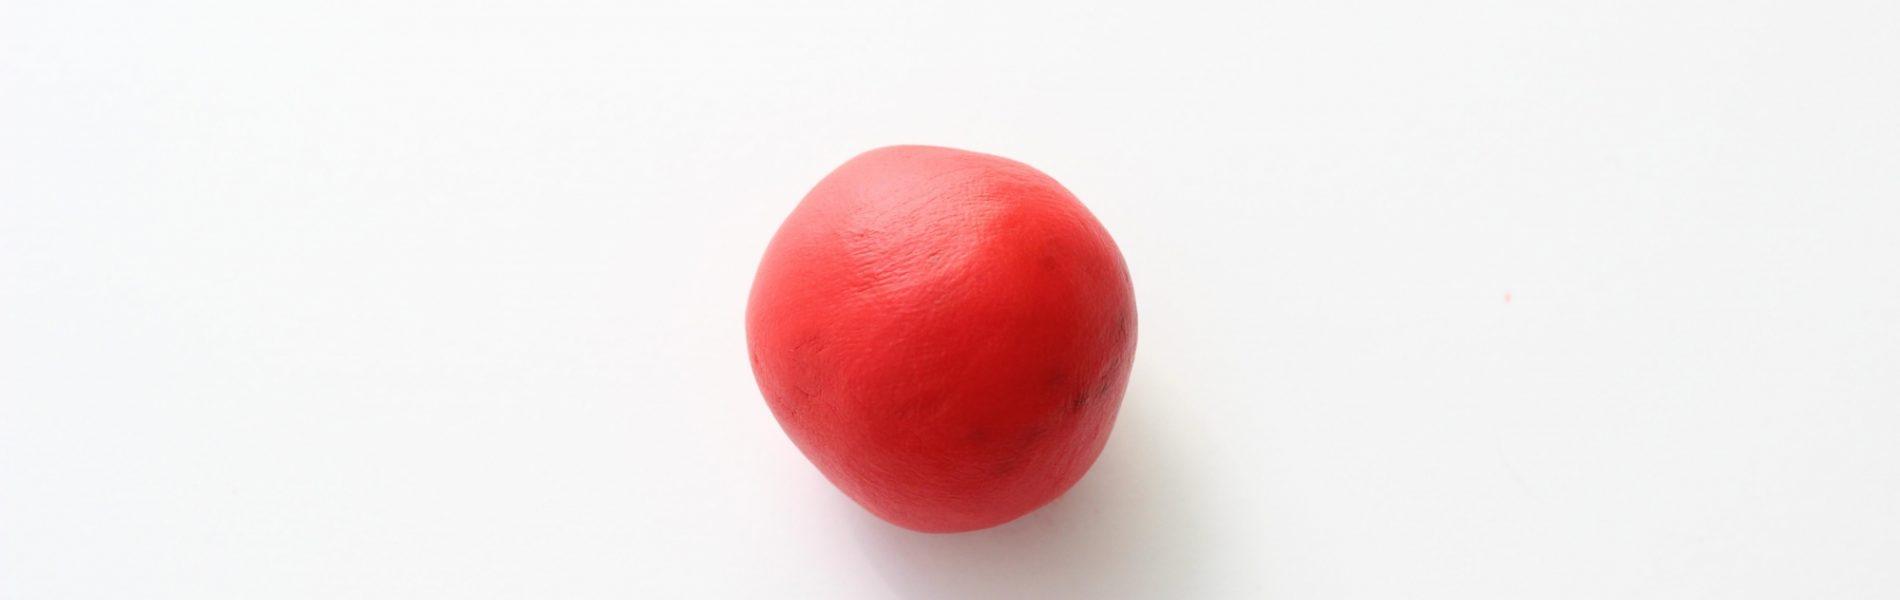 watermelon-Slice_IMG_0511.JPG?mtime=20200803105450#asset:344480:homeHero